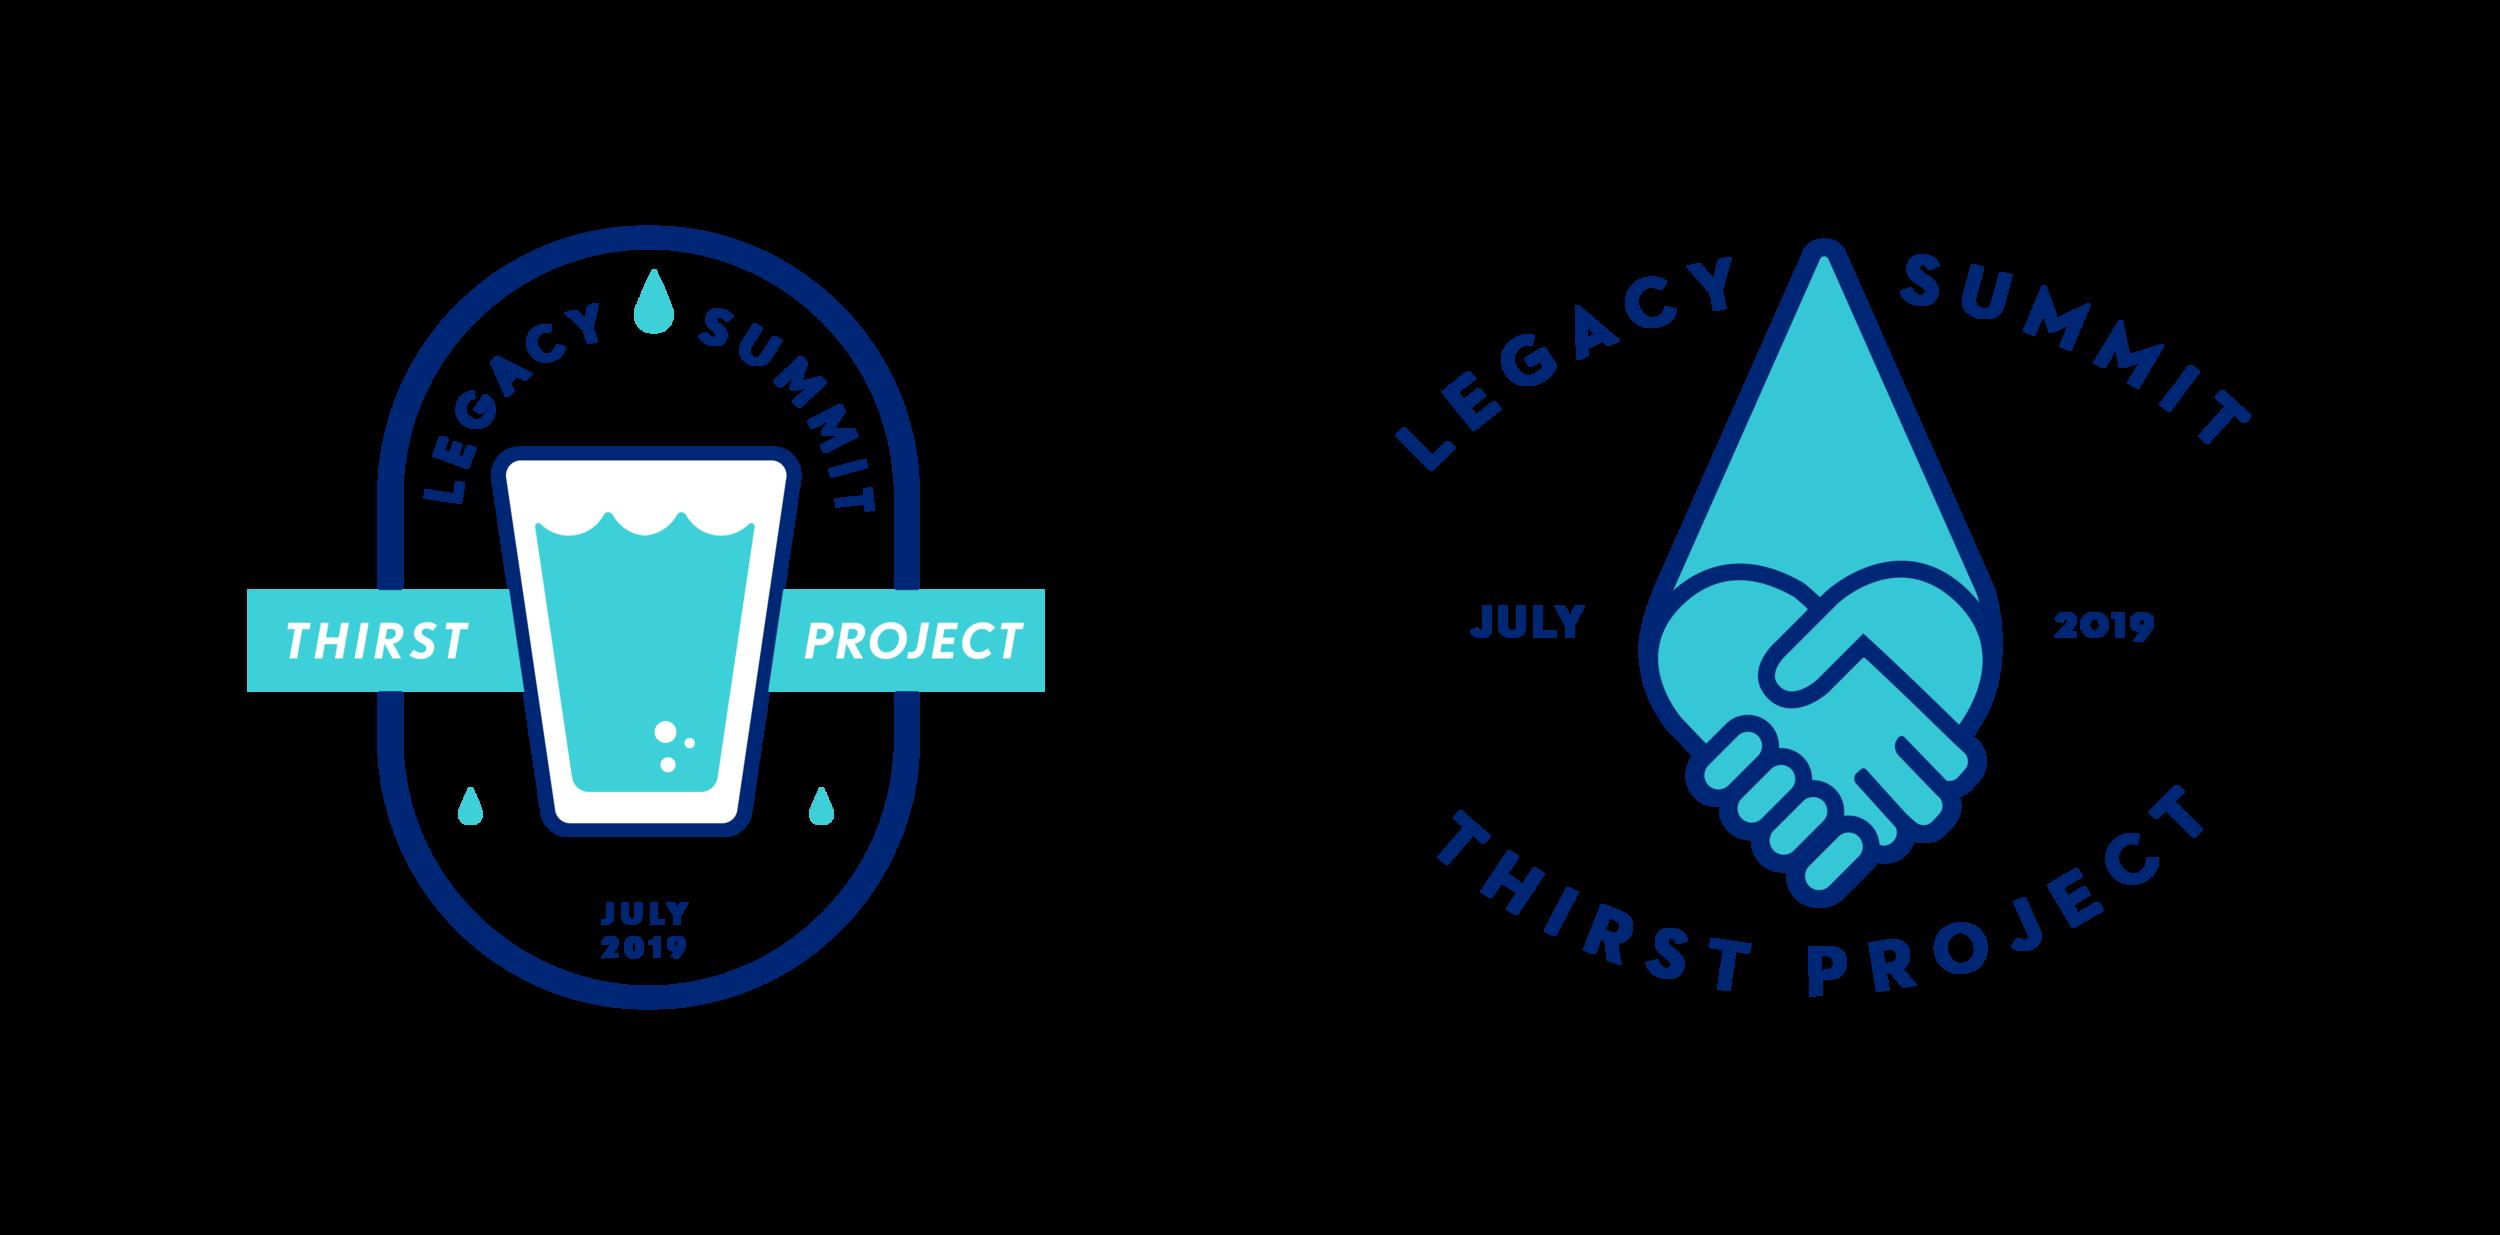 thirstproject_legacysummit copy-13-13-13.png